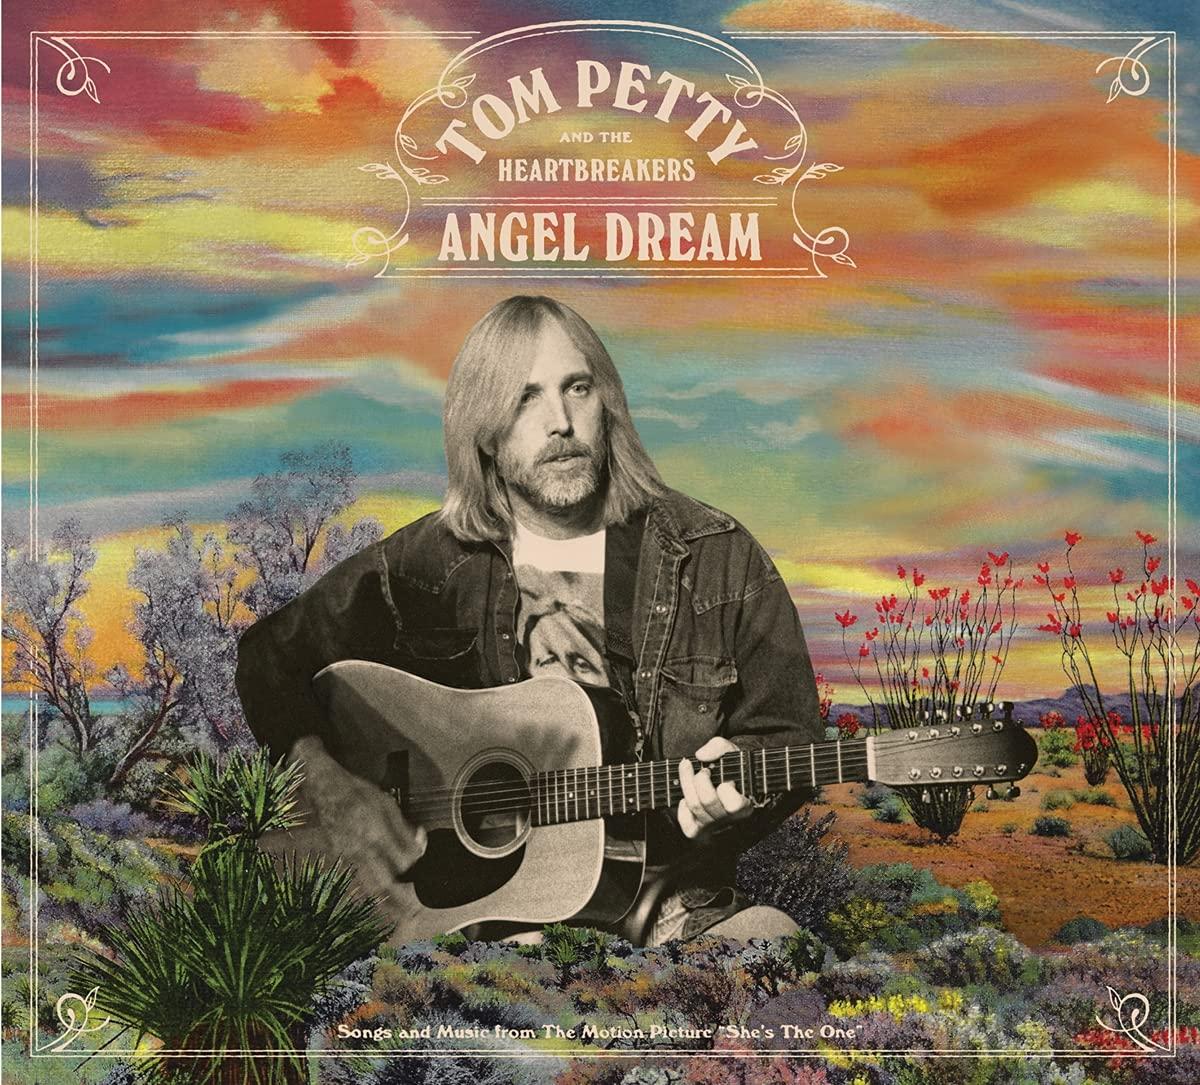 Staronové album Toma Pettyho